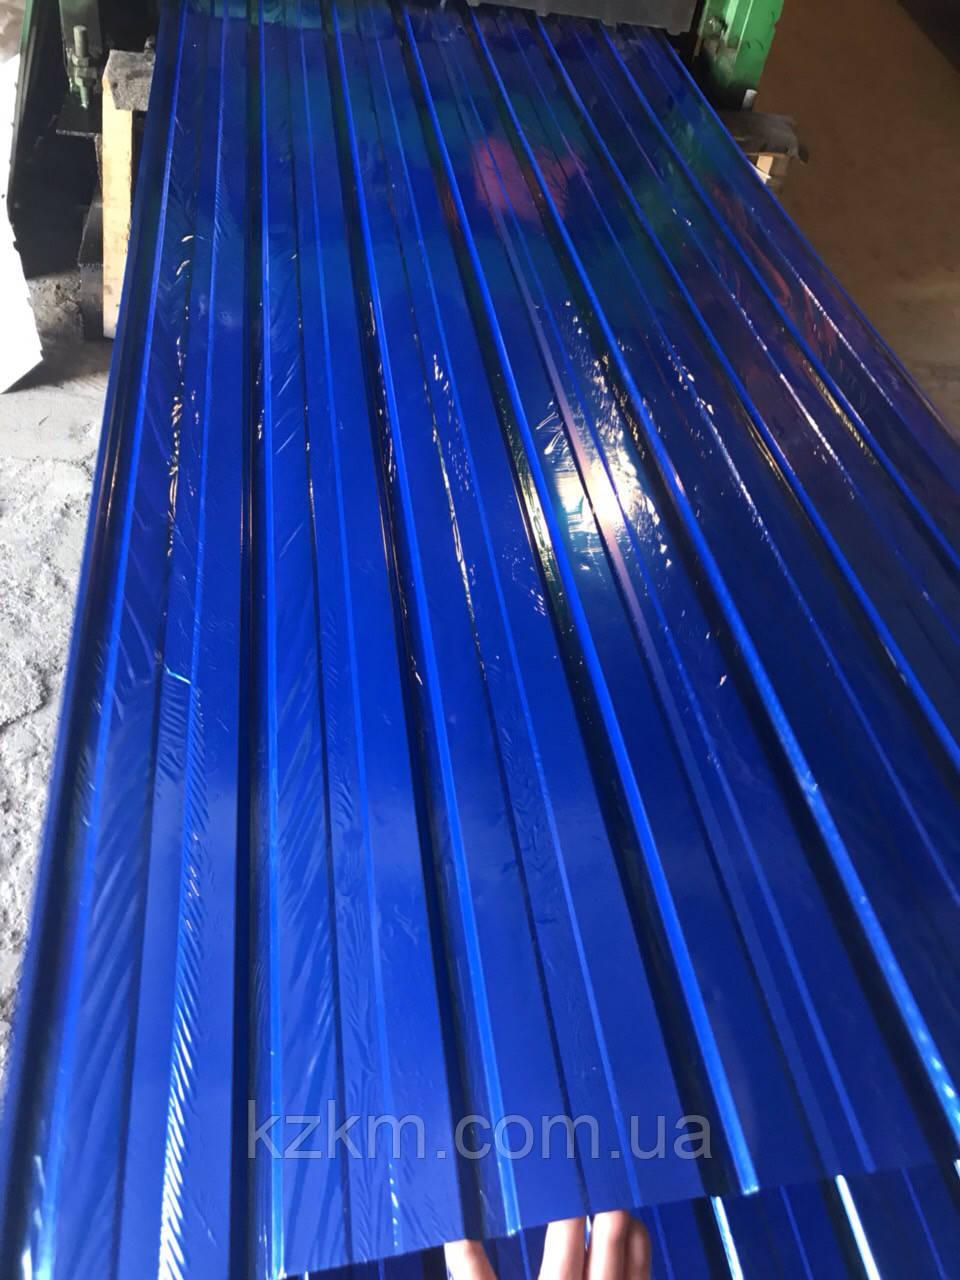 Профнастил синий RAL 5002